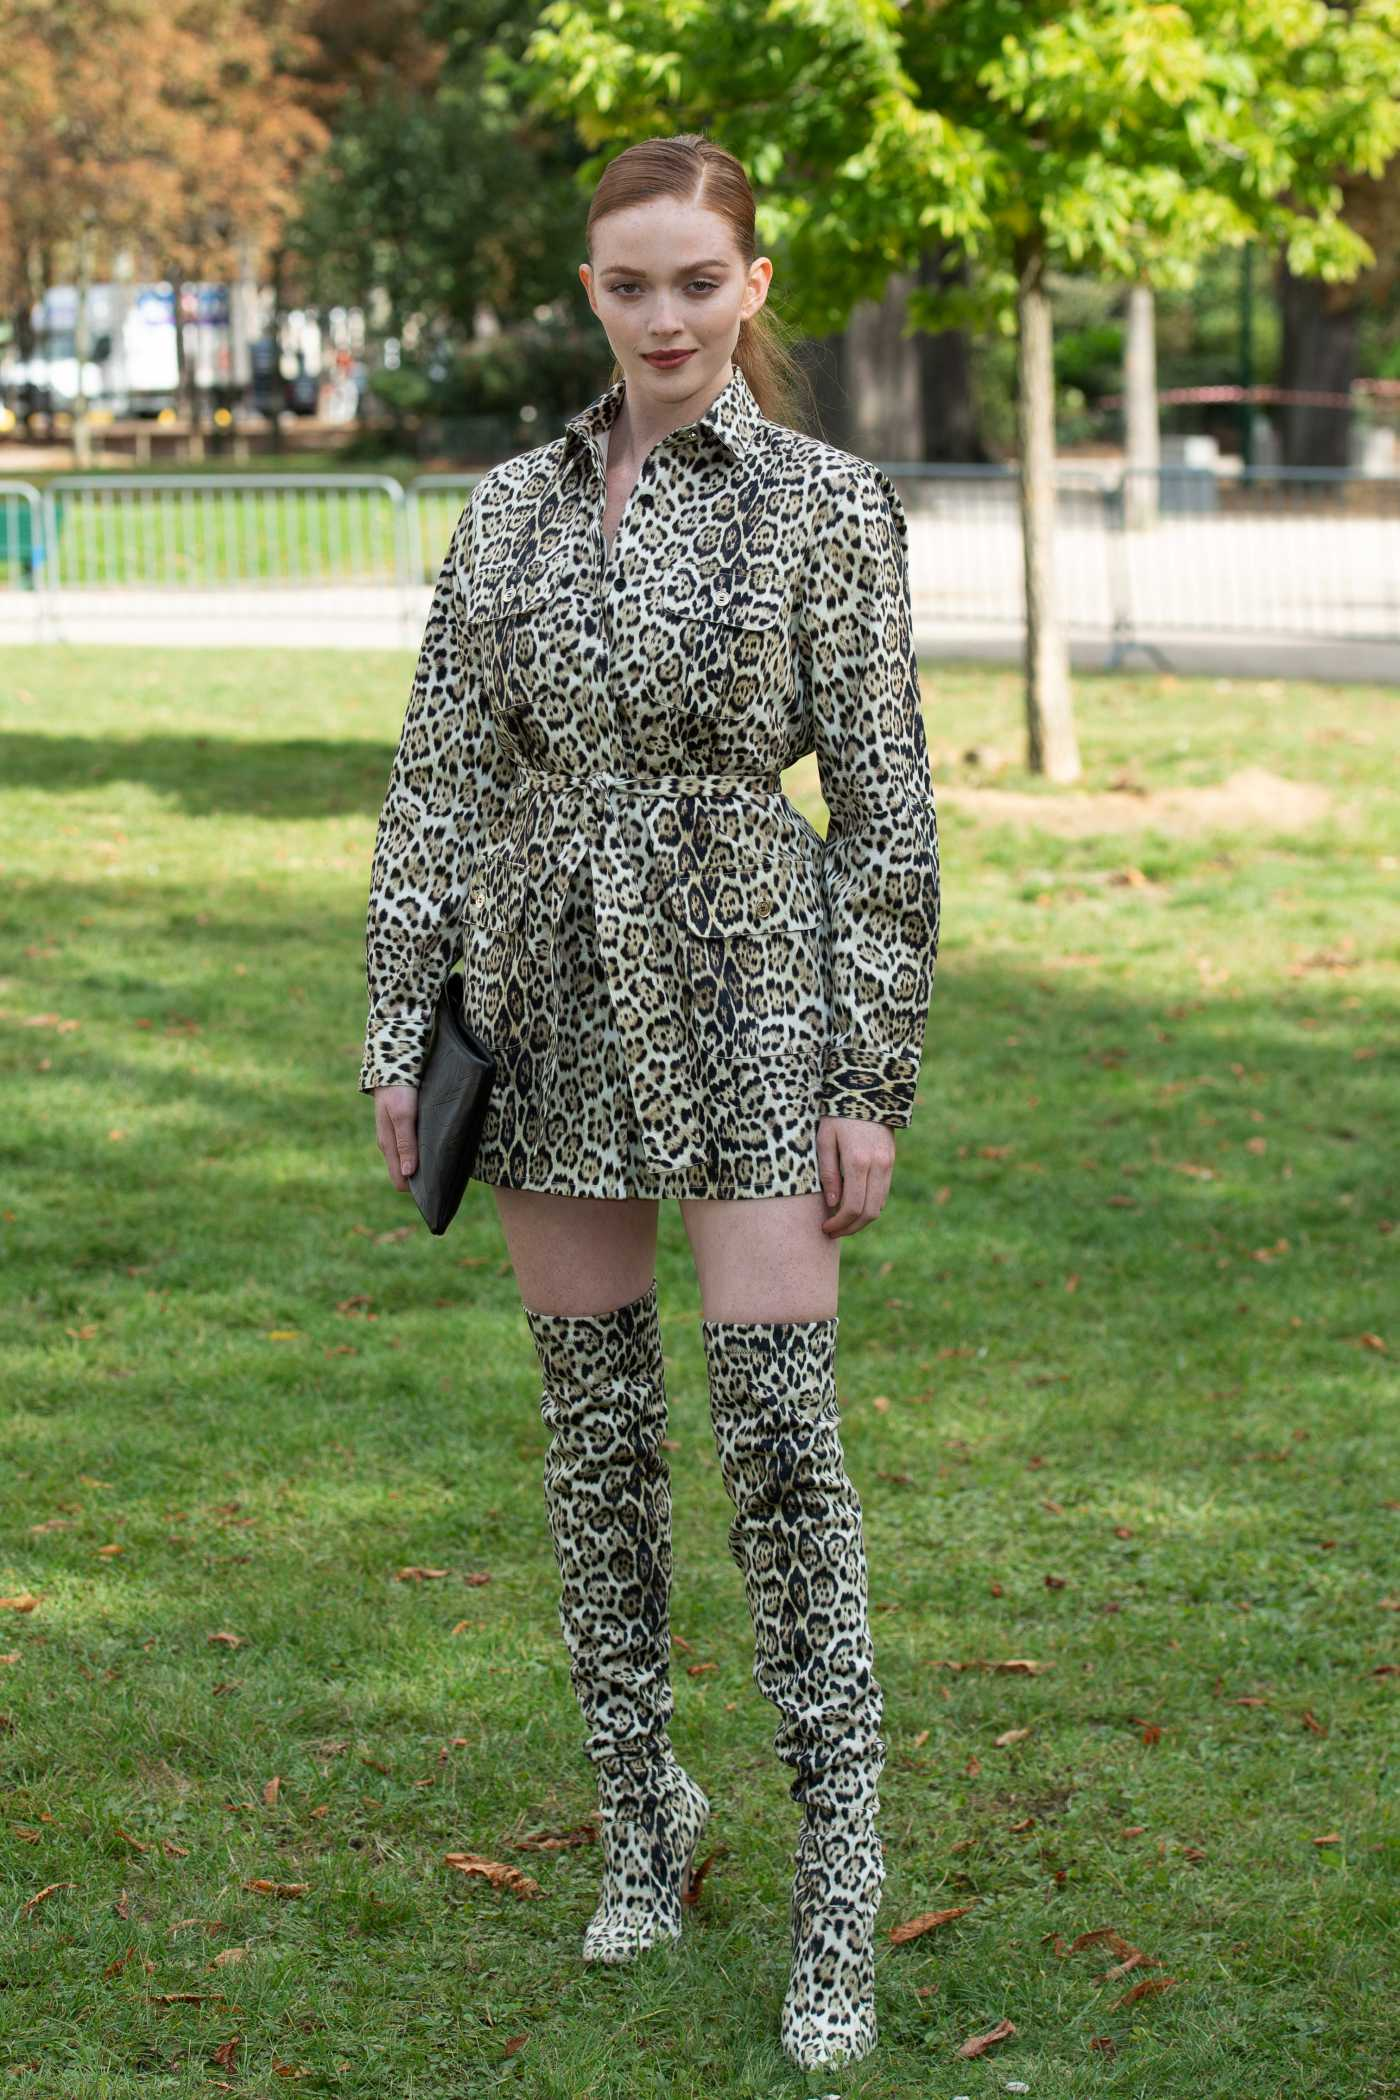 Larsen Thompson Attends the Elie Saab Fashion Show During 2019 Paris Fashion Week in Paris 09/28/2019